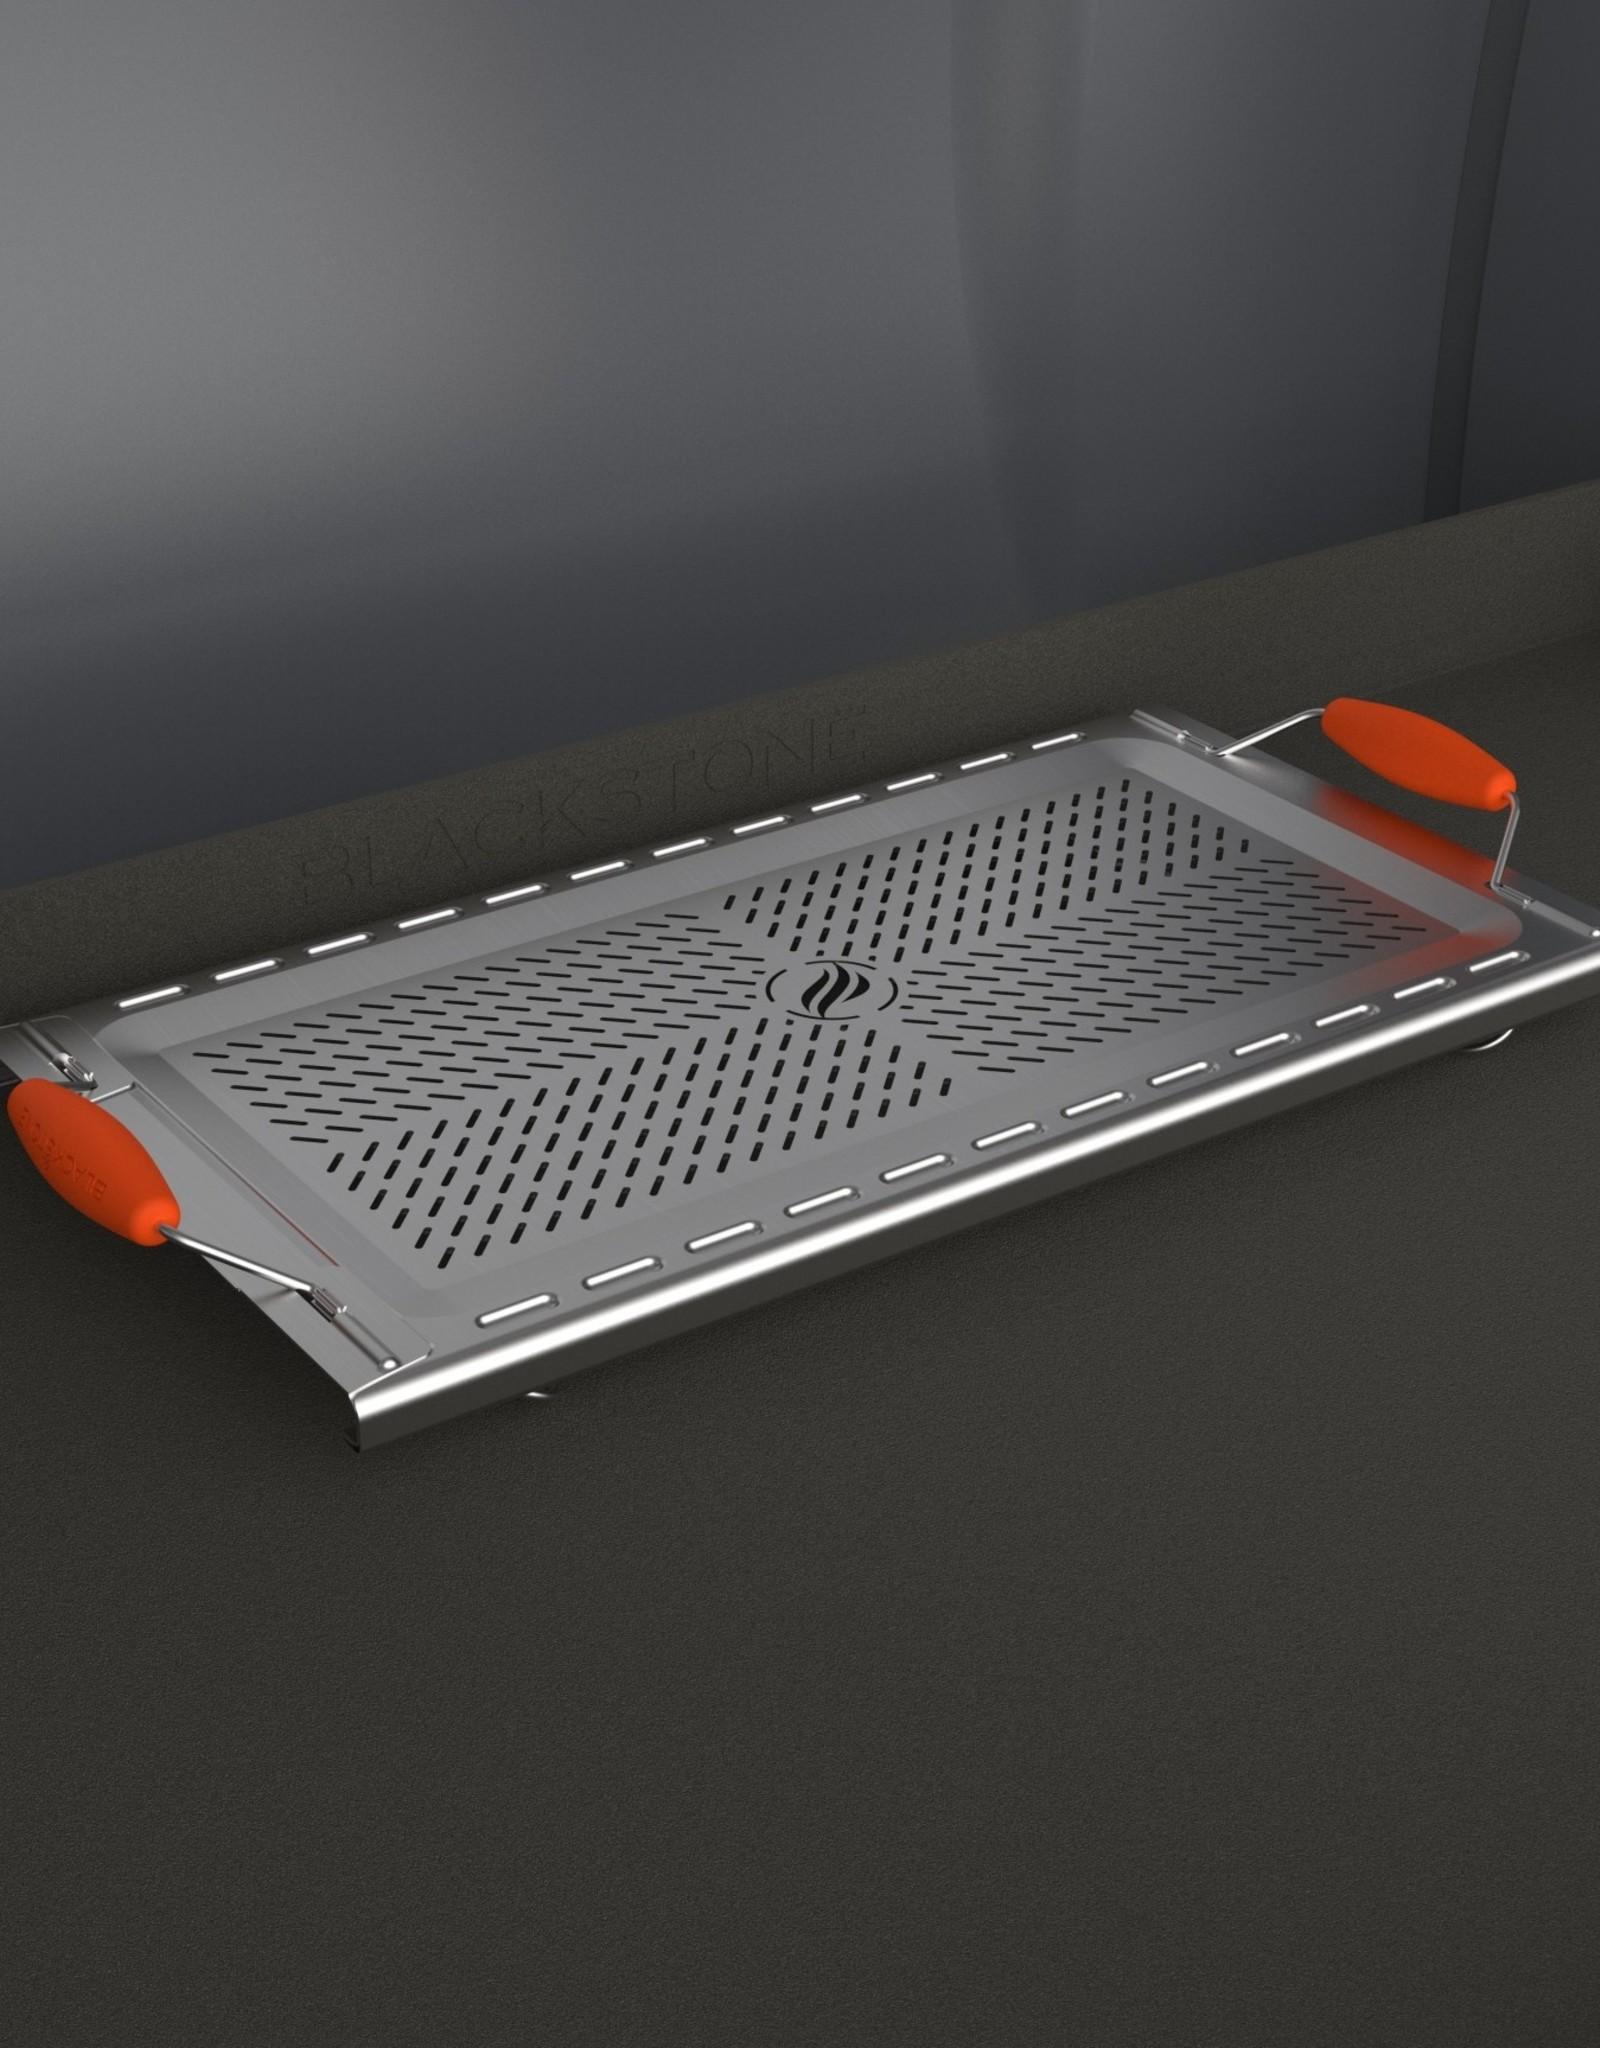 Blackstone Blackstone Stainless Steel Adjustable Warming Rack - 5318